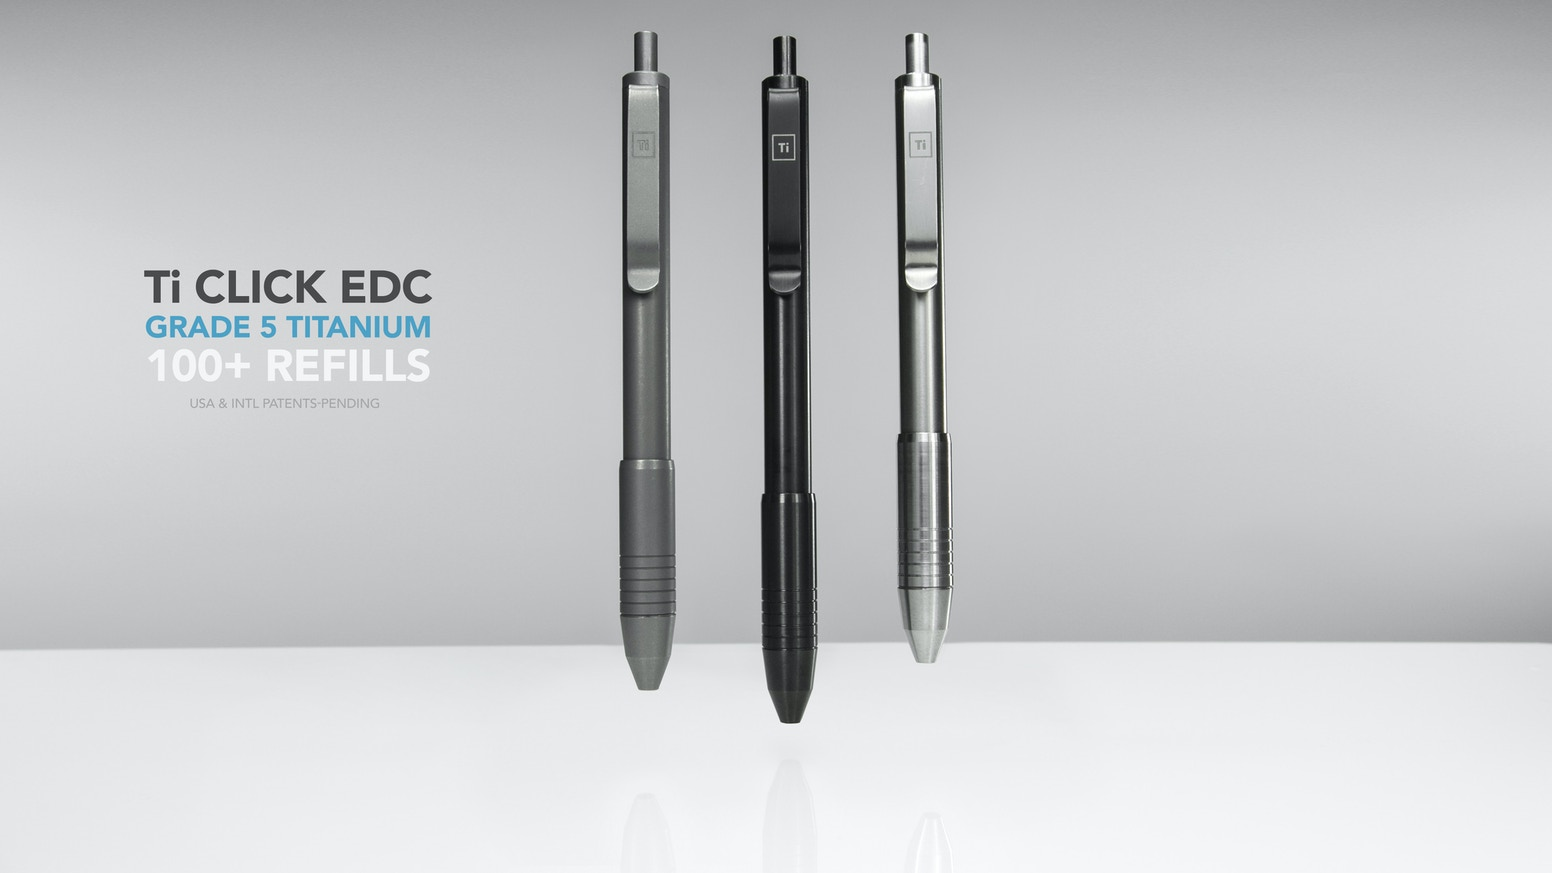 ti click edc the ultimate refill friendly click pen by chadwick